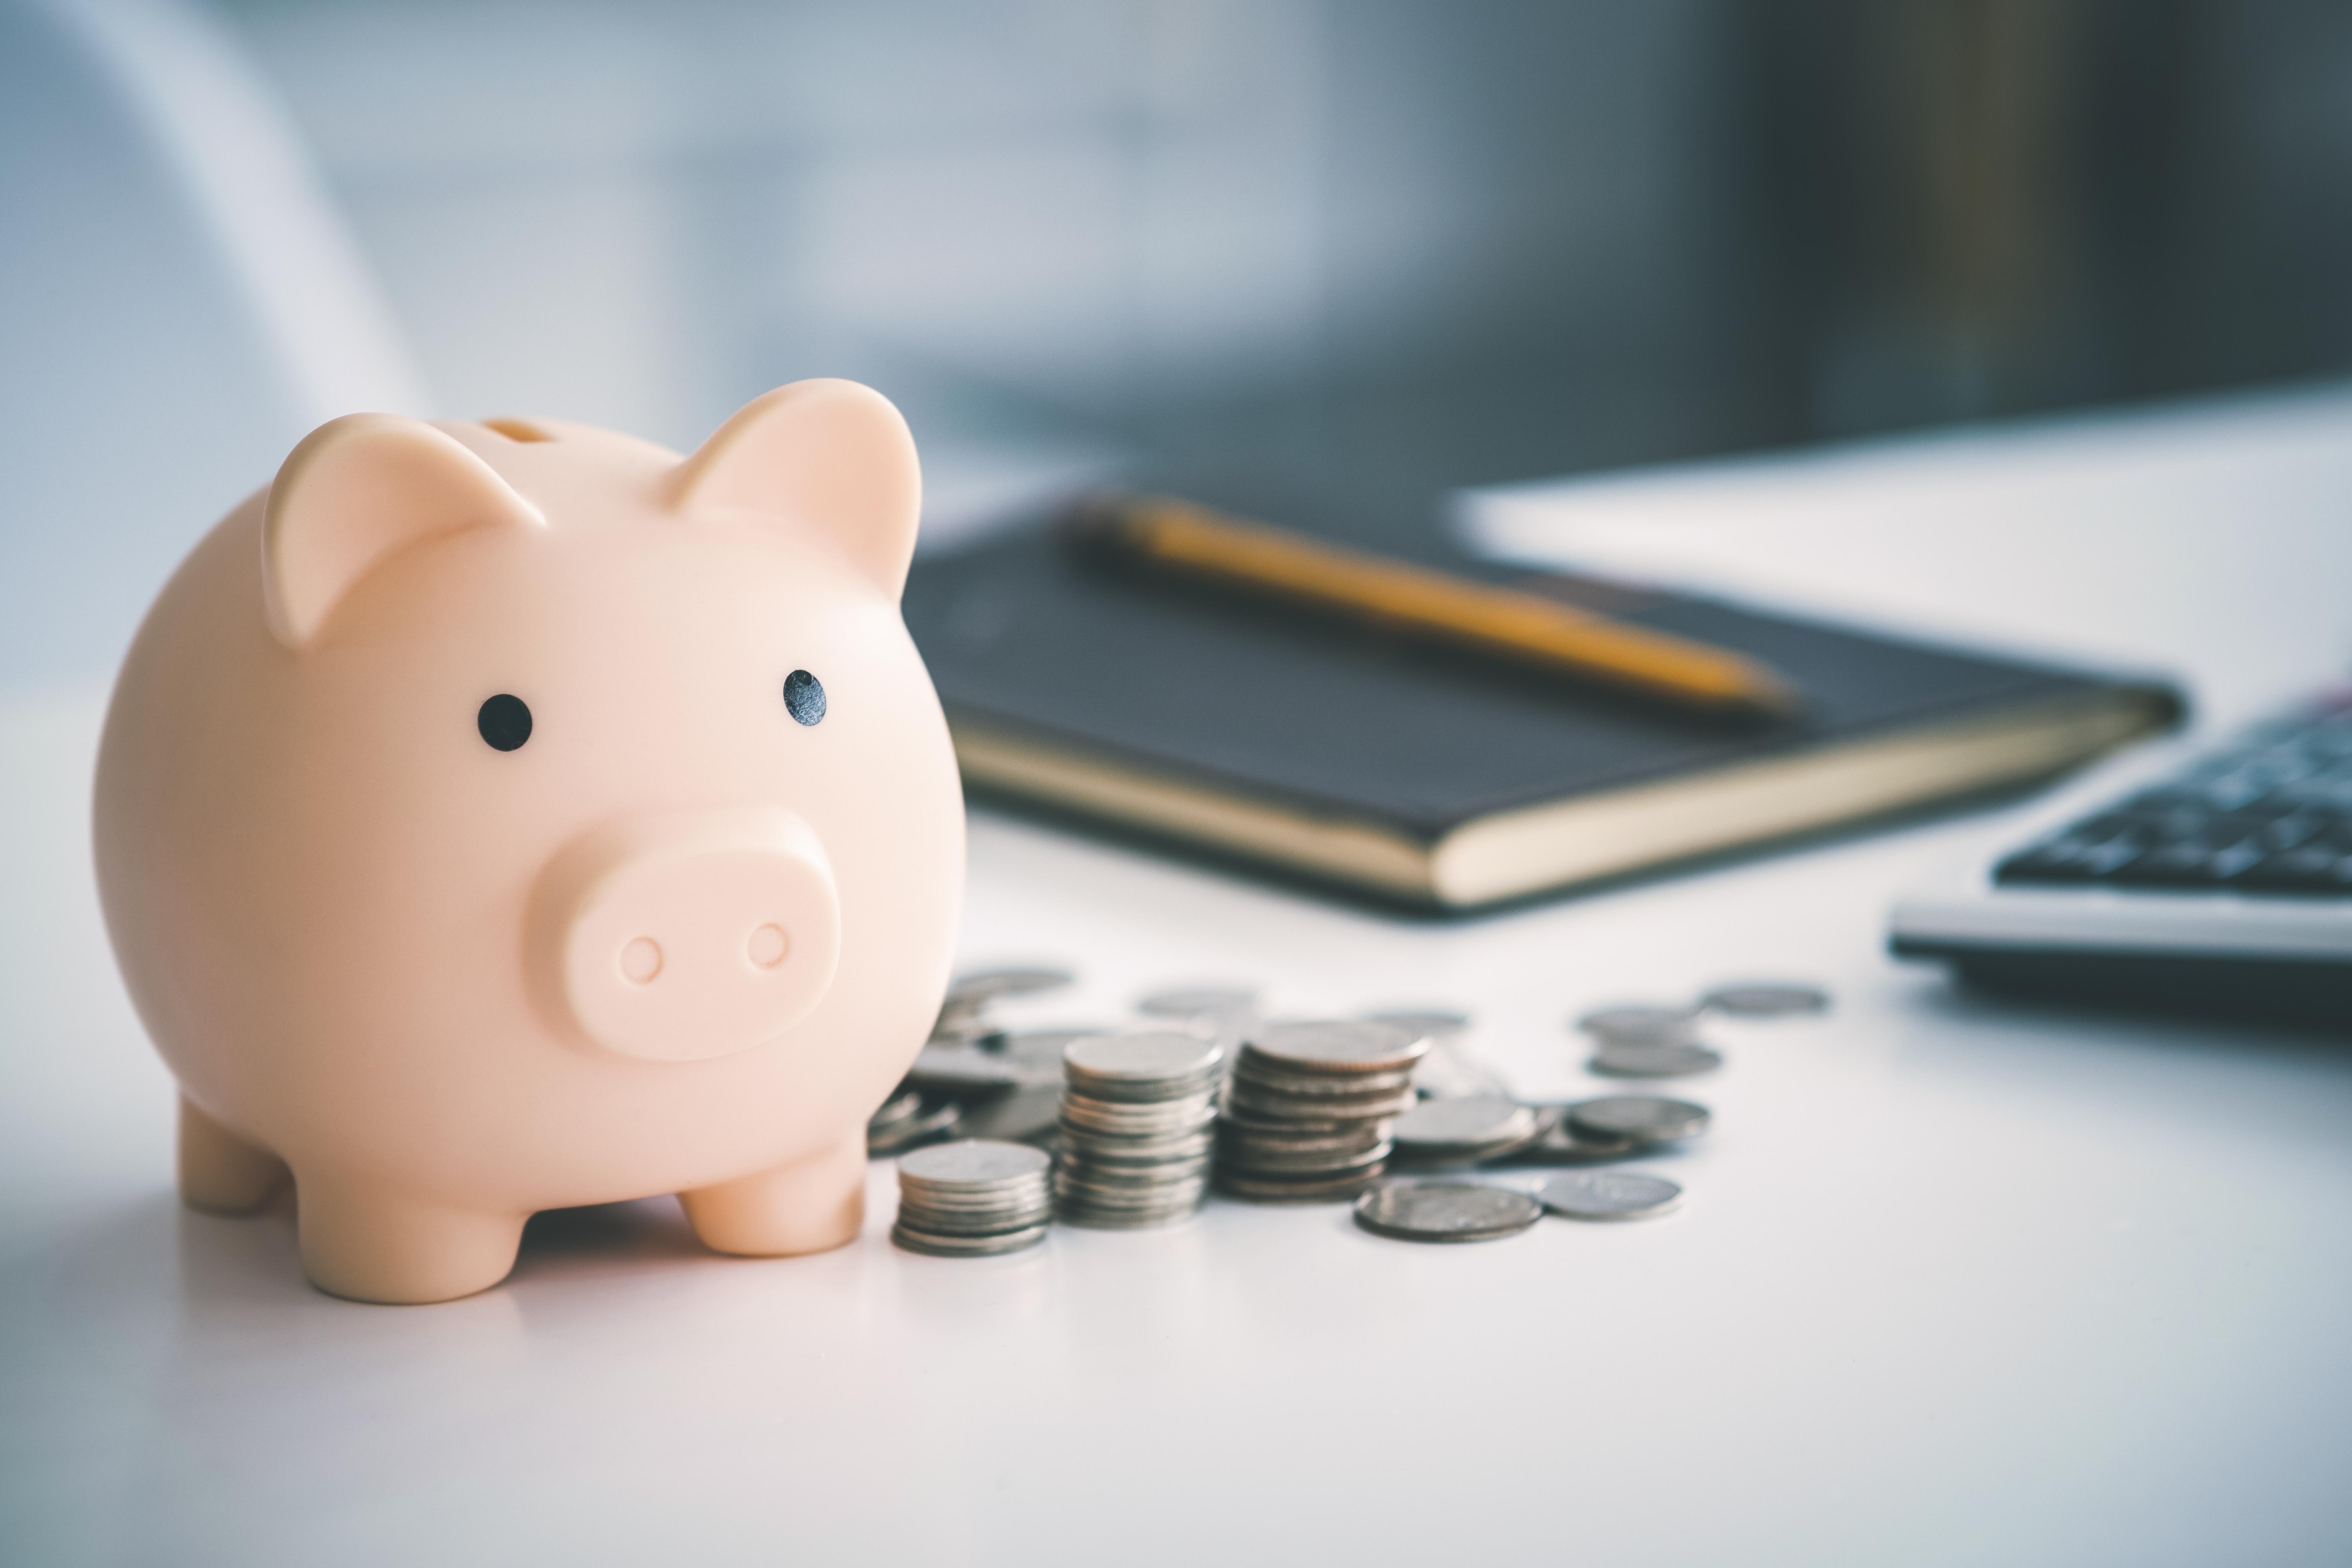 pig-bank-and-money-2021-06-07-17-19-29-utc